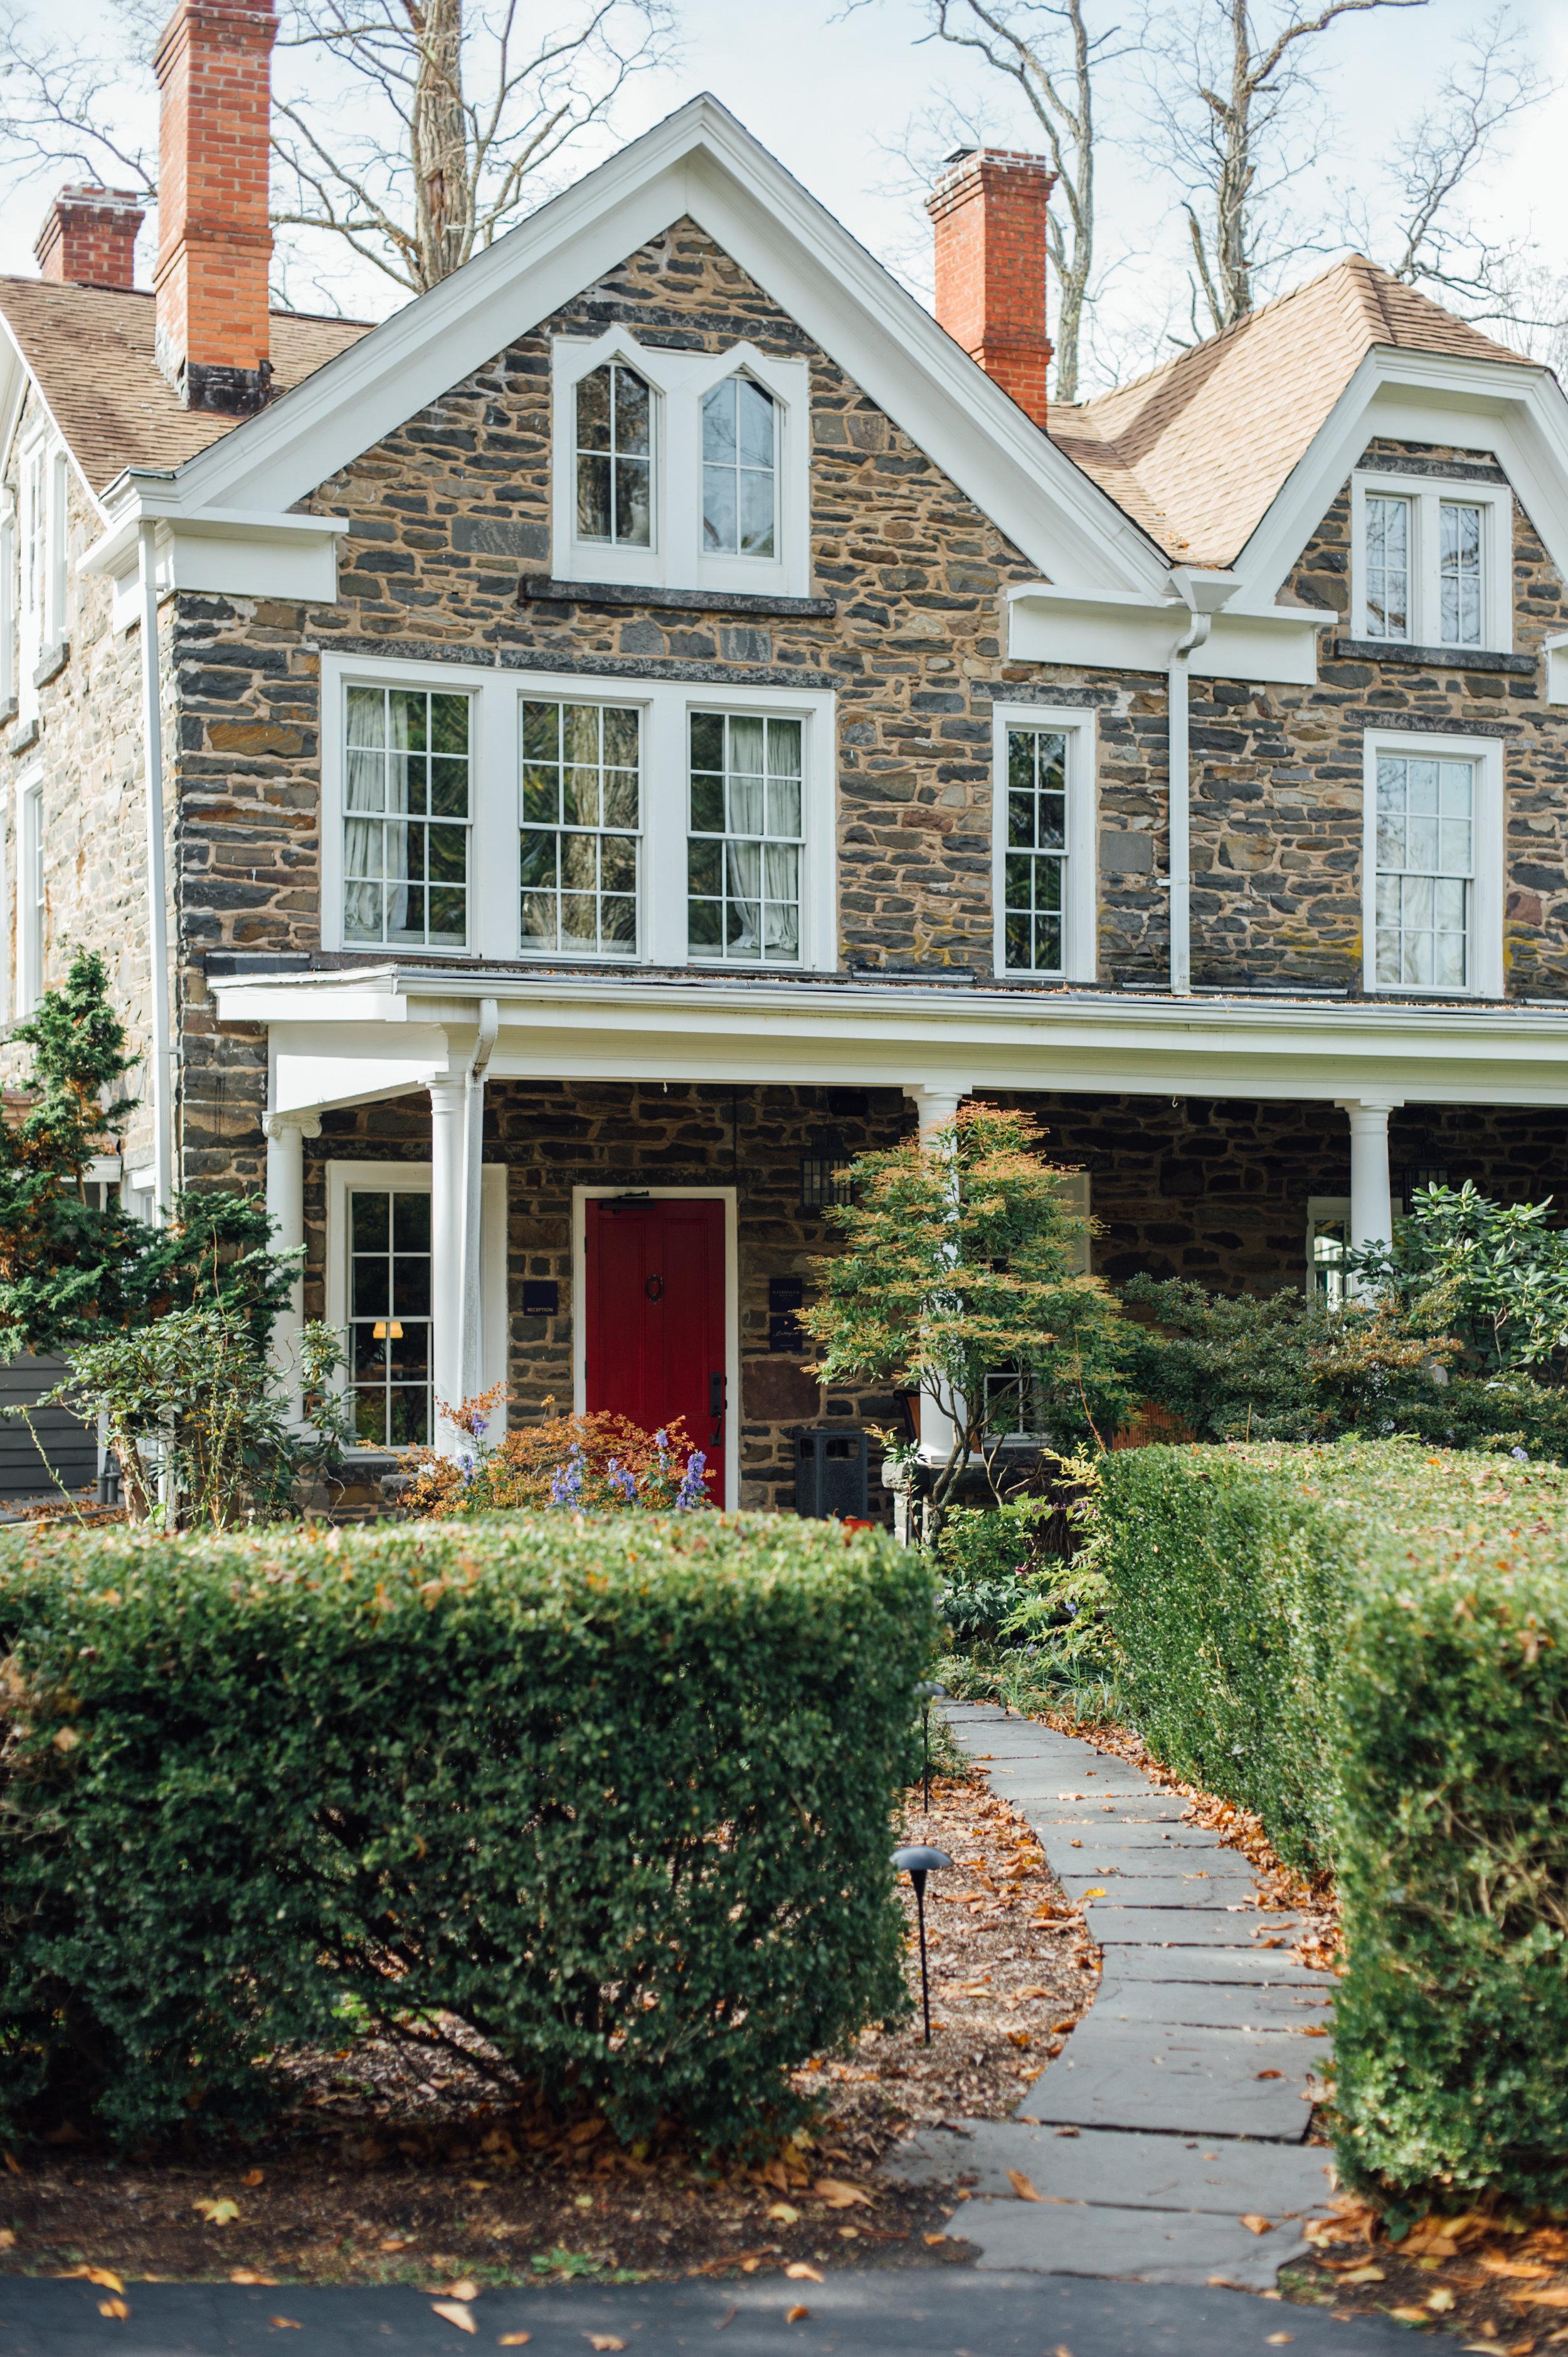 hasbrouck house catskills upstate new york